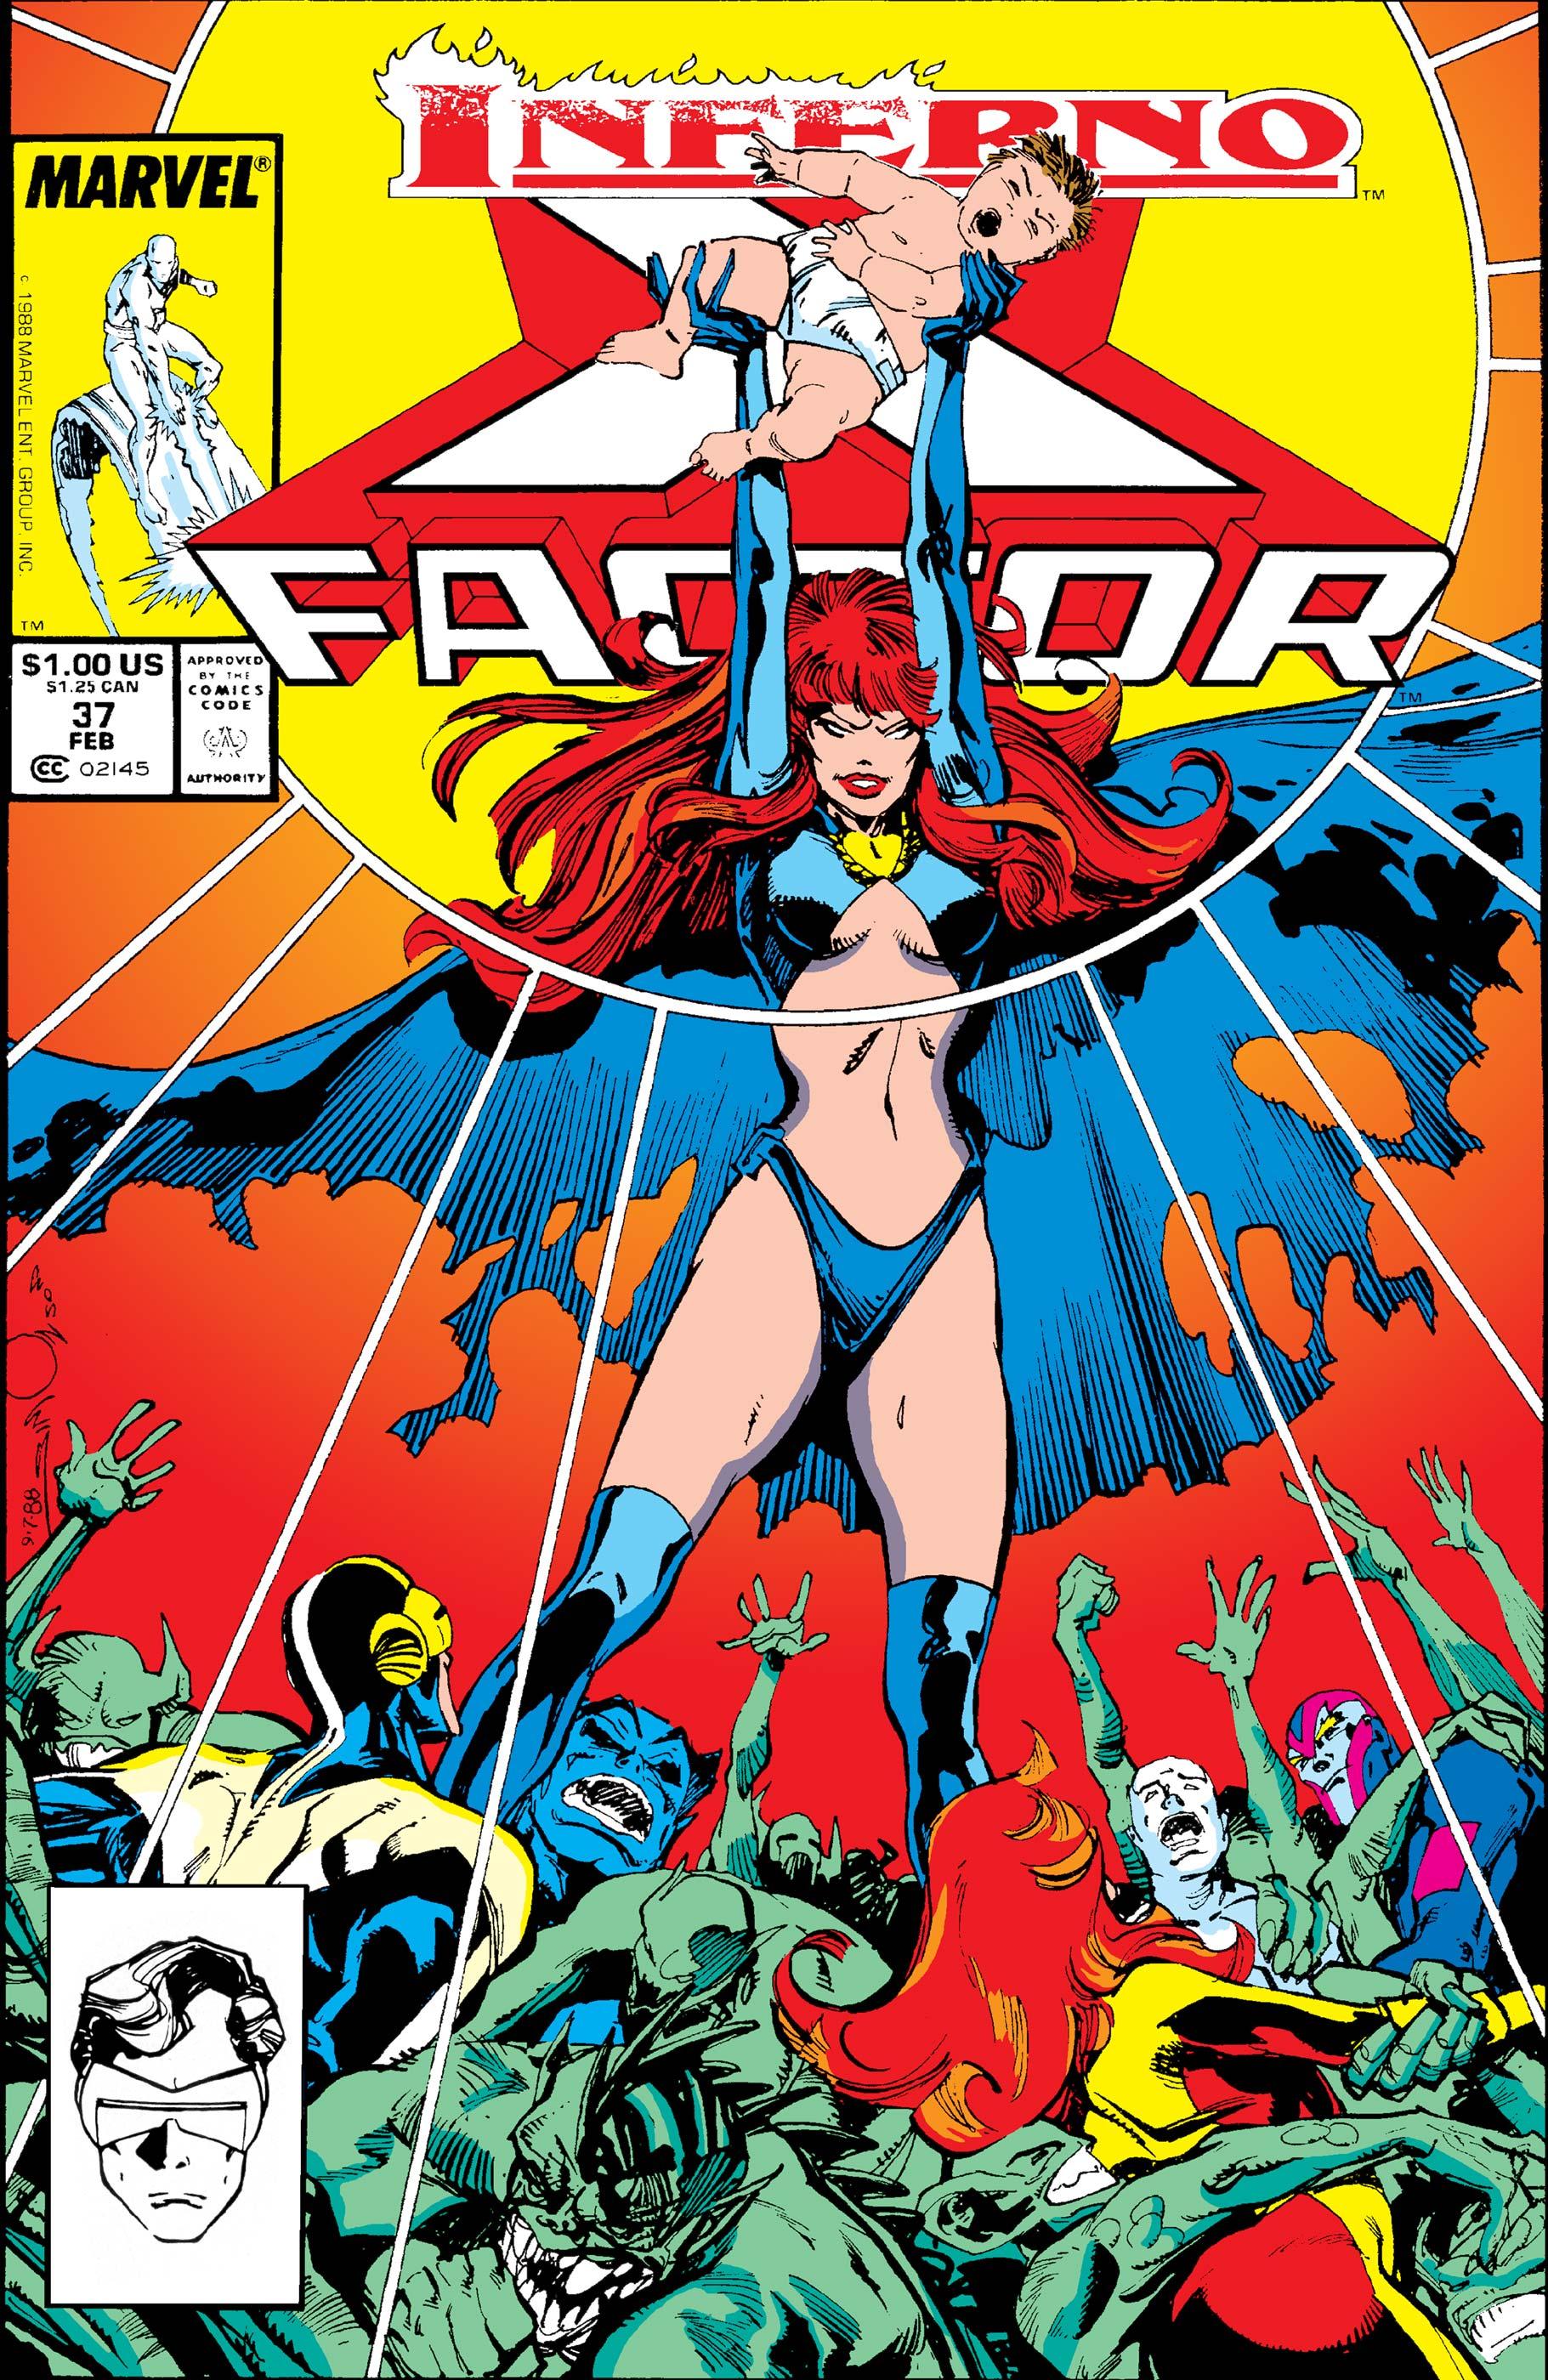 X-Factor (1986) #37